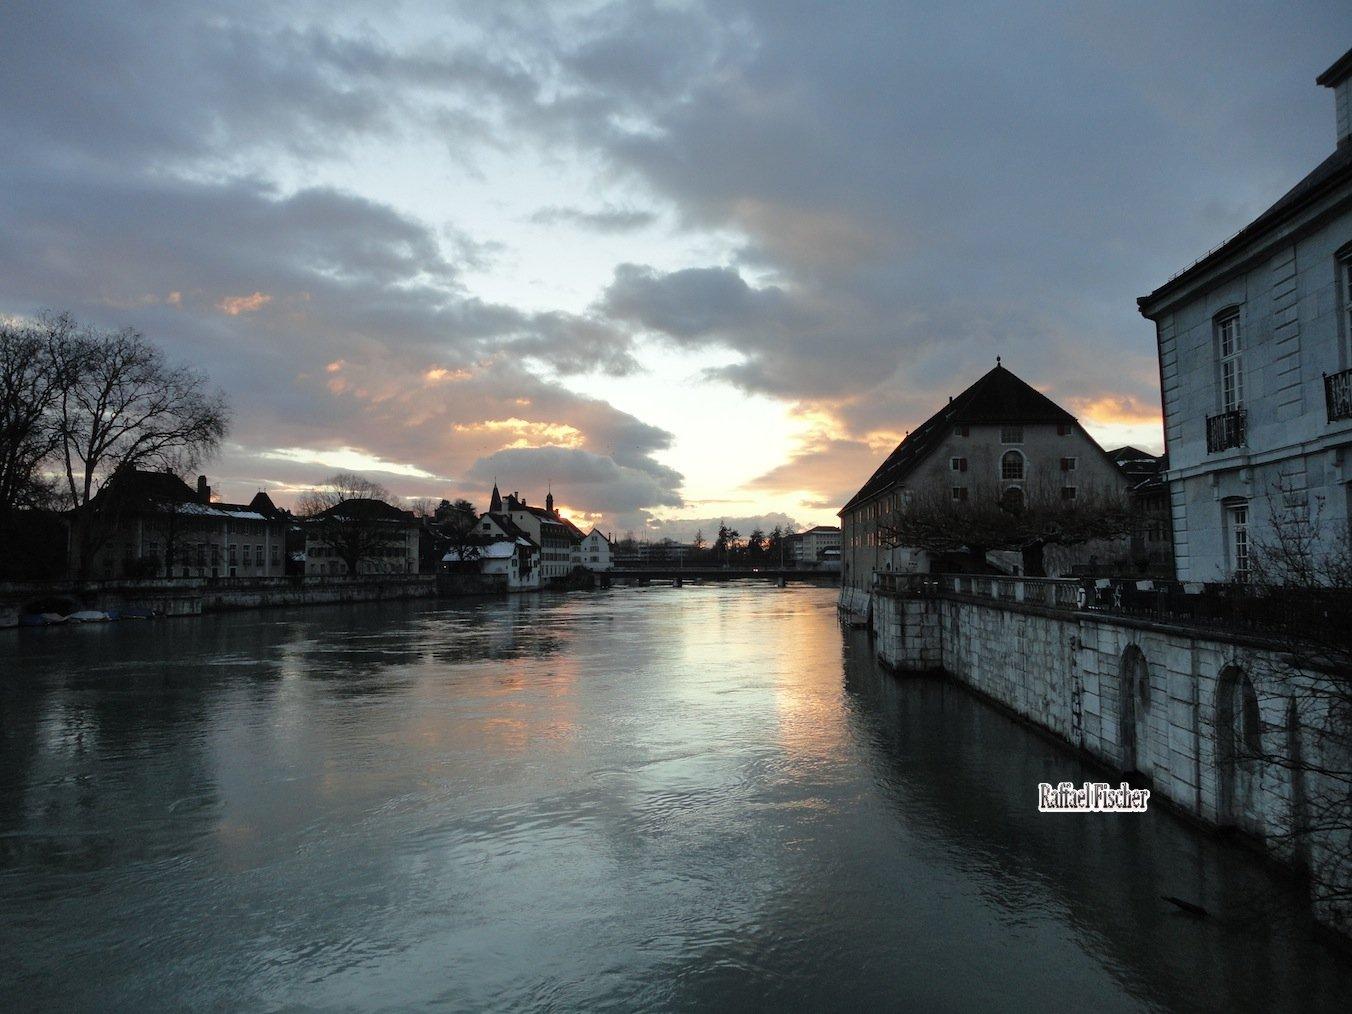 Dämmerung in Solothurn